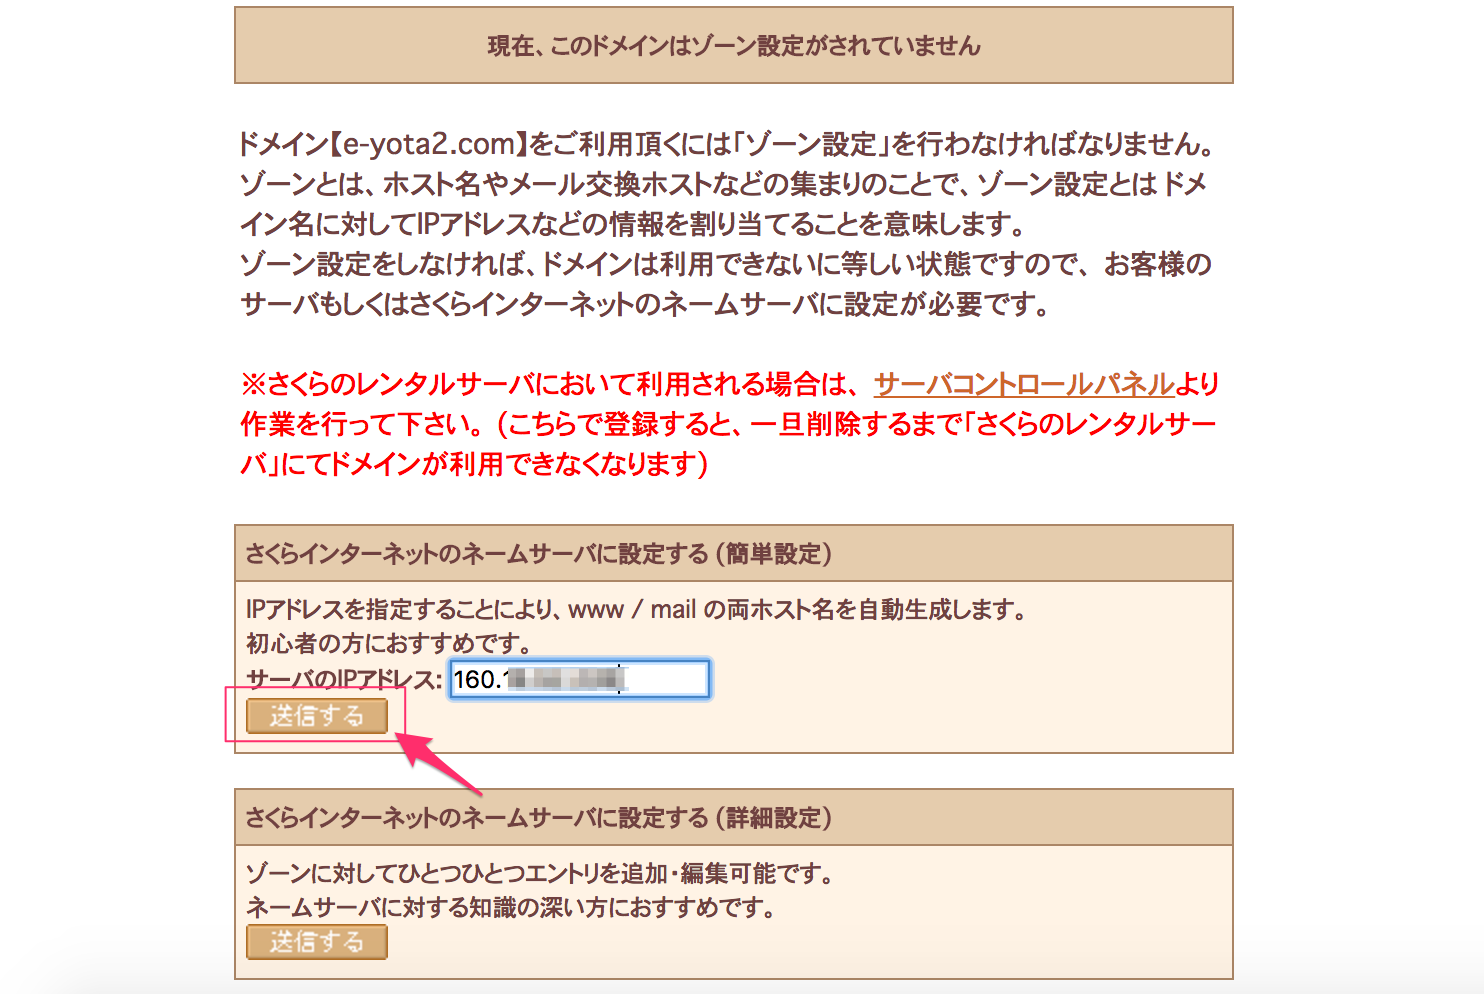 sakurainternet_dns_zone_setup_5